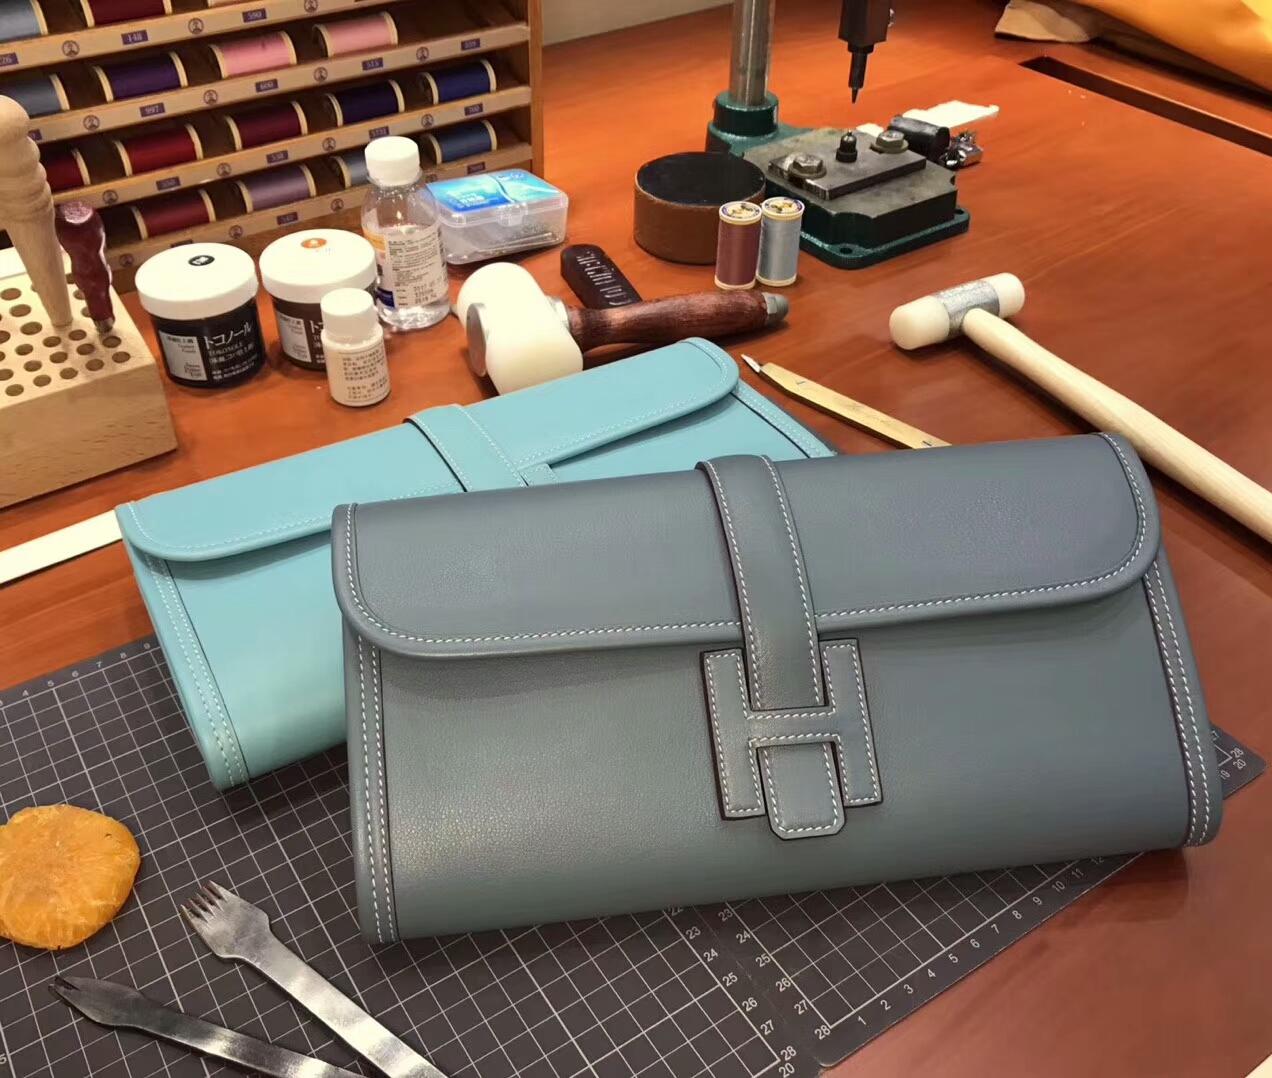 J7 亚麻蓝 Blue Lin HERMES 爱马仕 手包 配全套专柜原版包装 全球发售